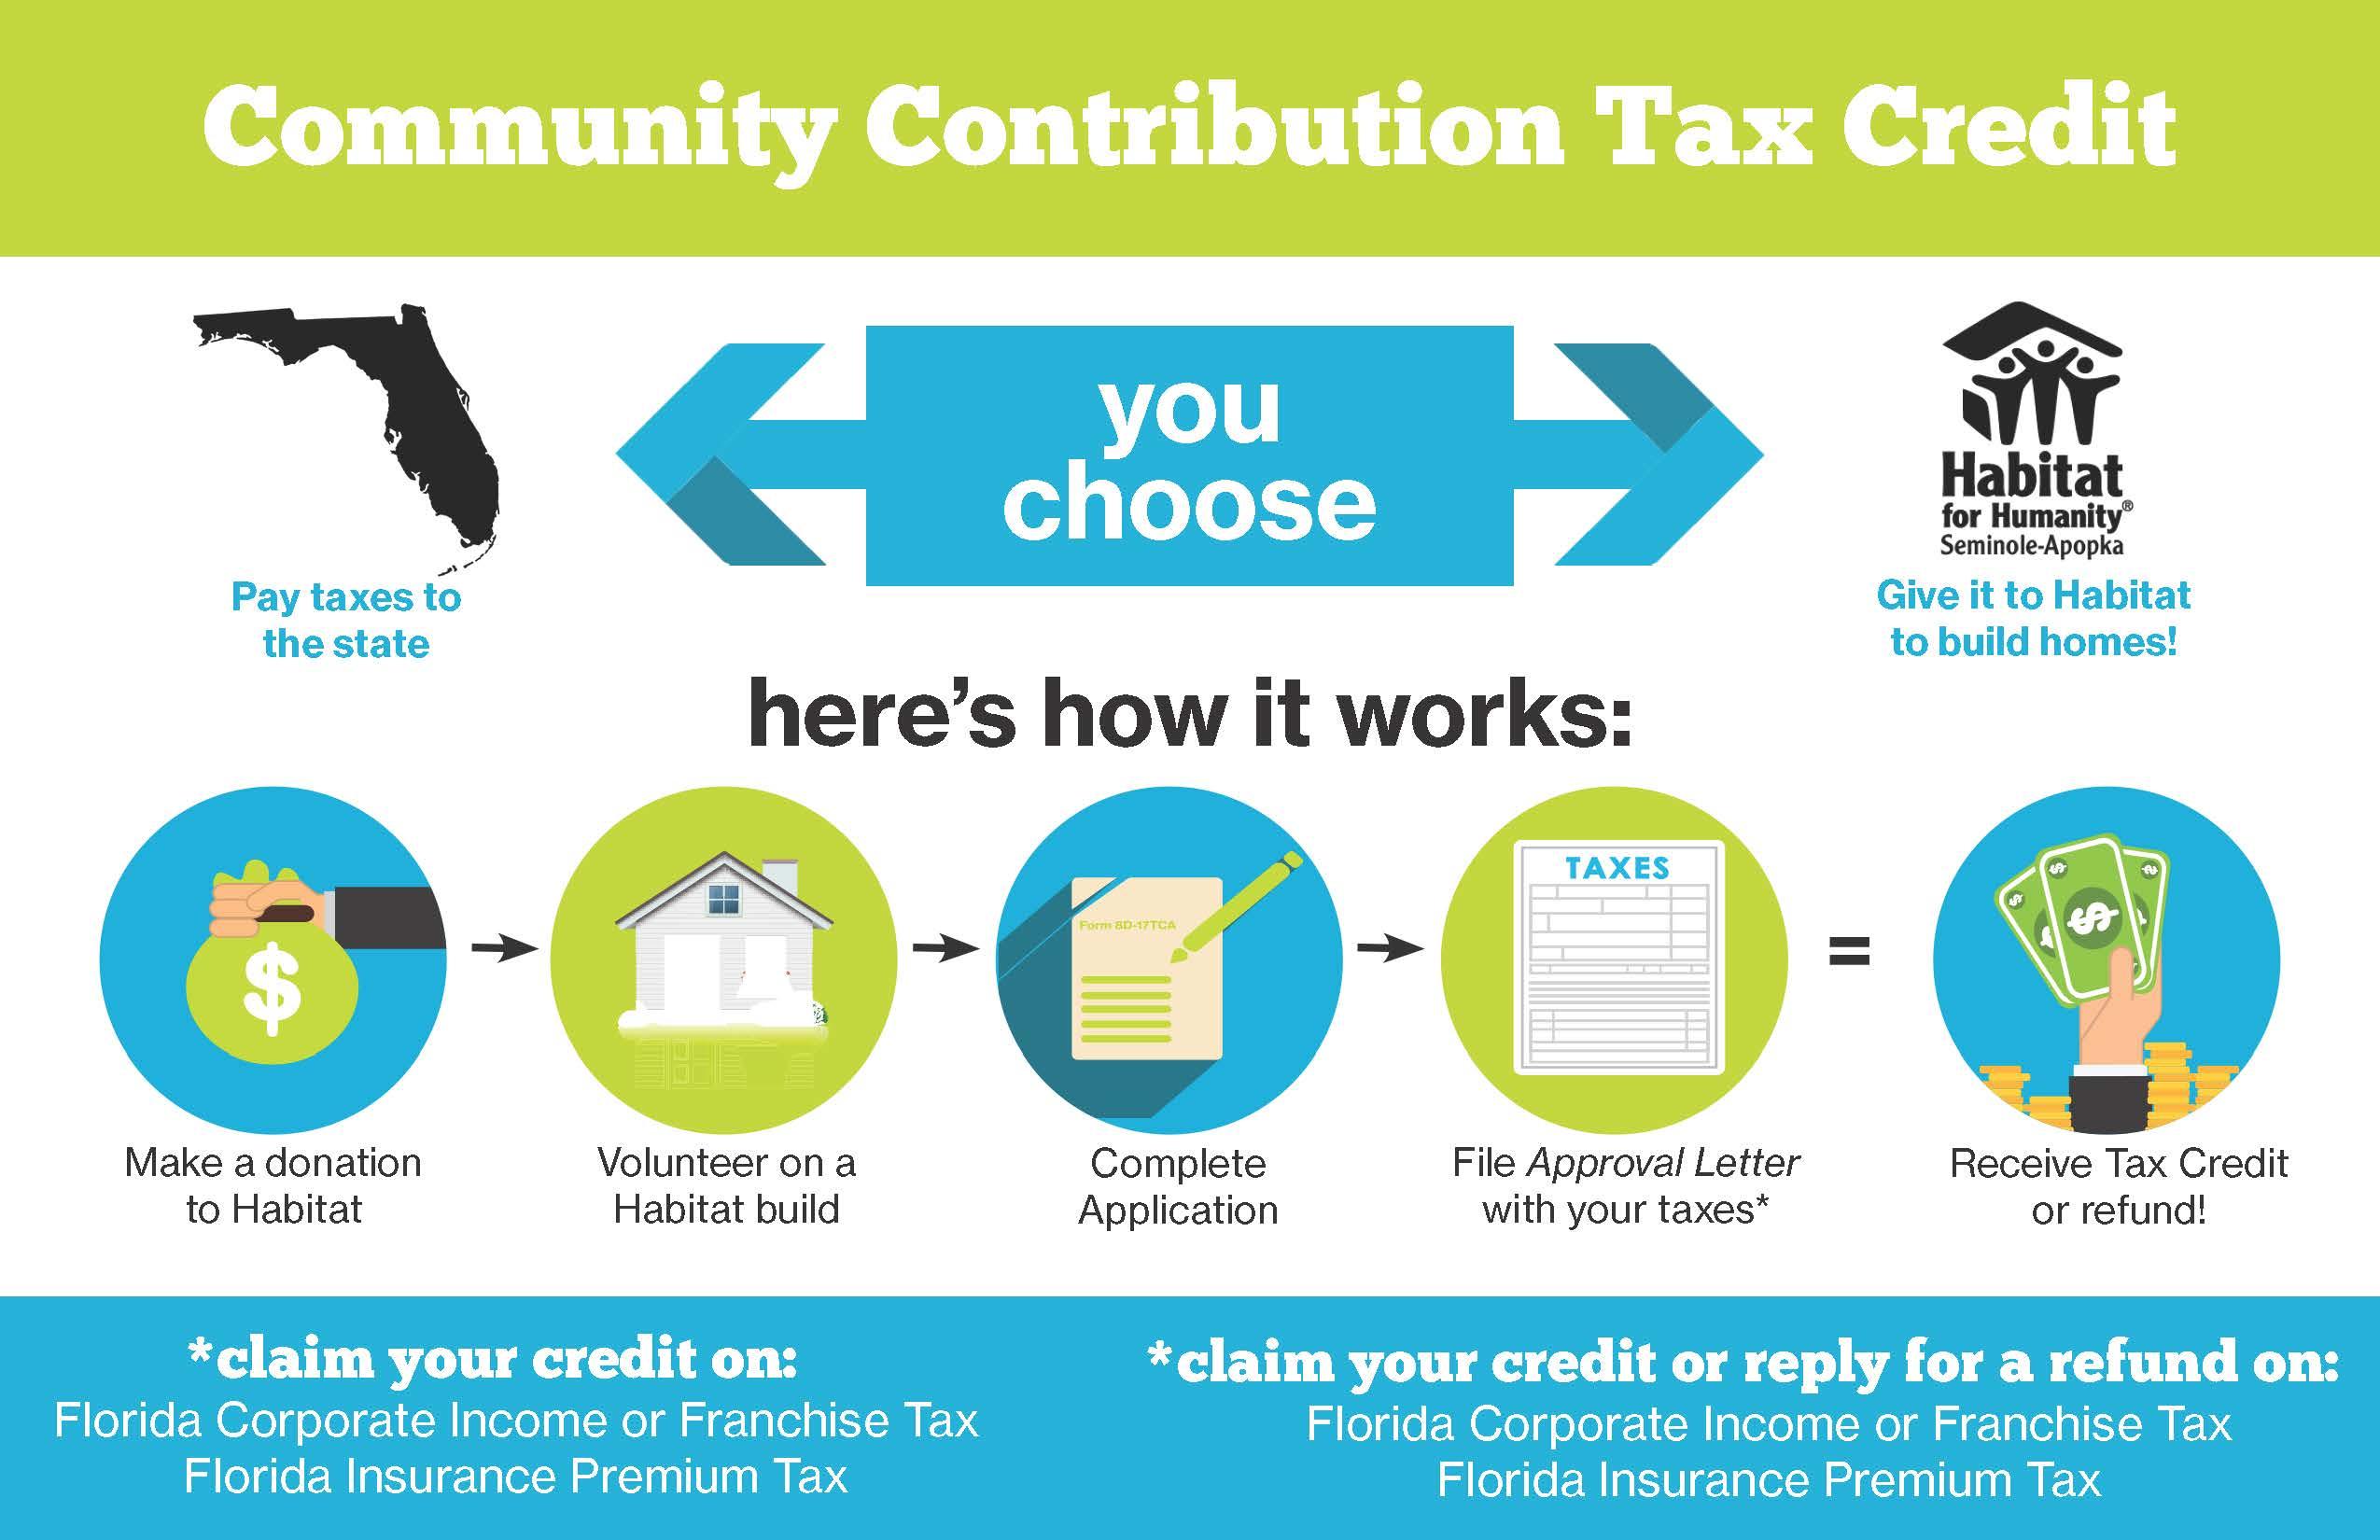 Habitat for Humanity - Community Contribution Tax Credit